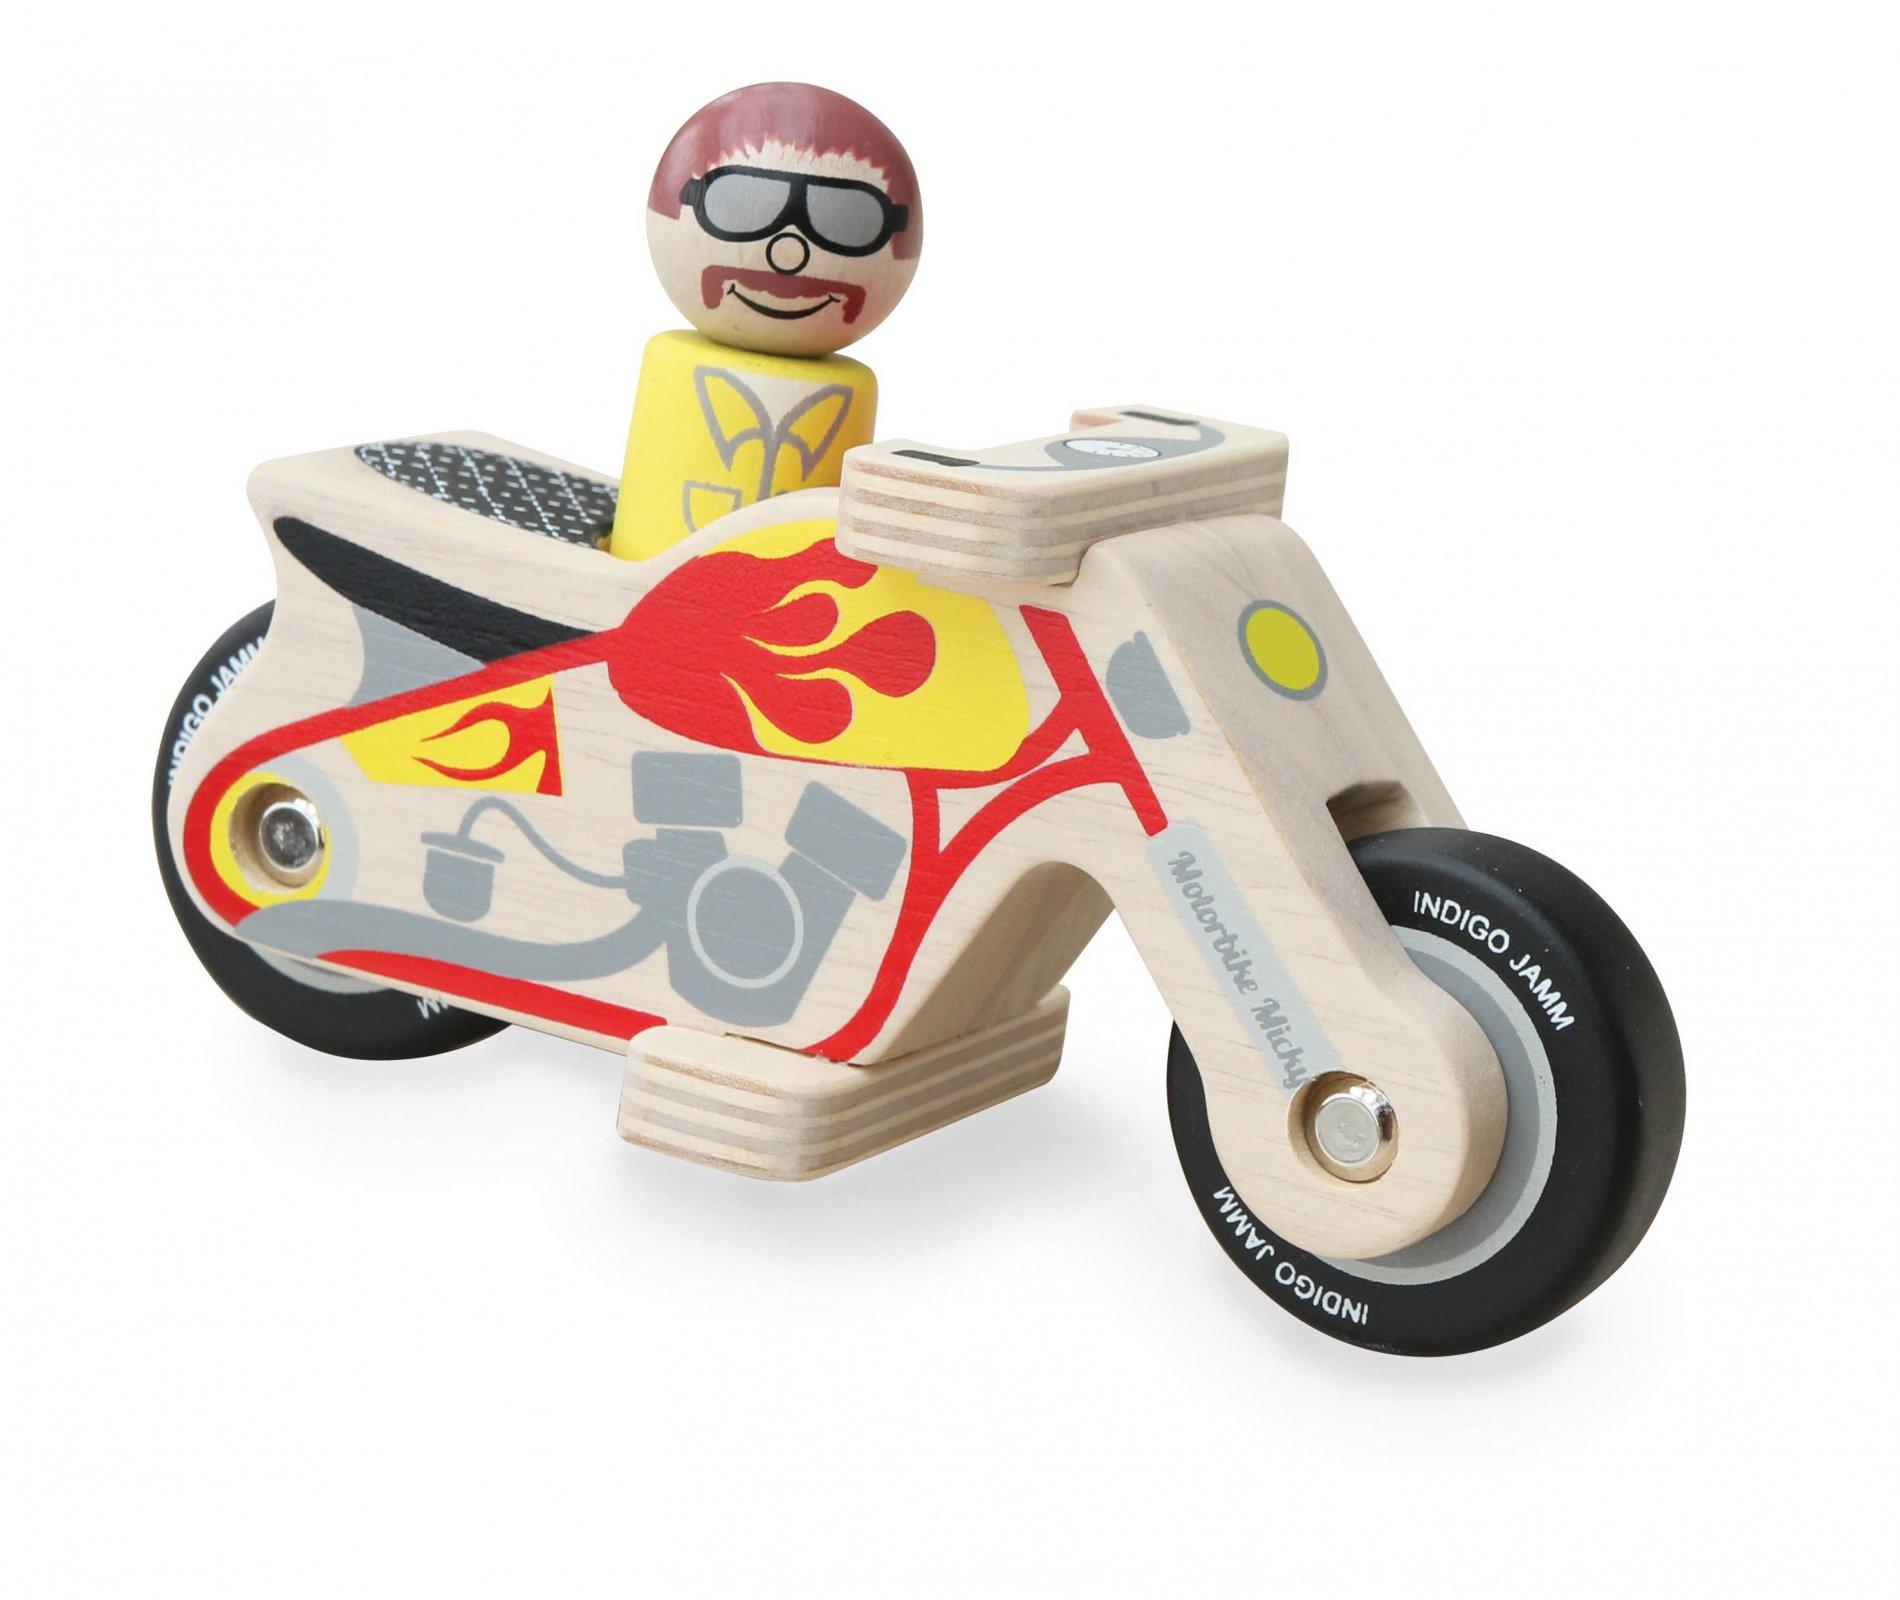 Motorbike Micky by Indigo Jamm